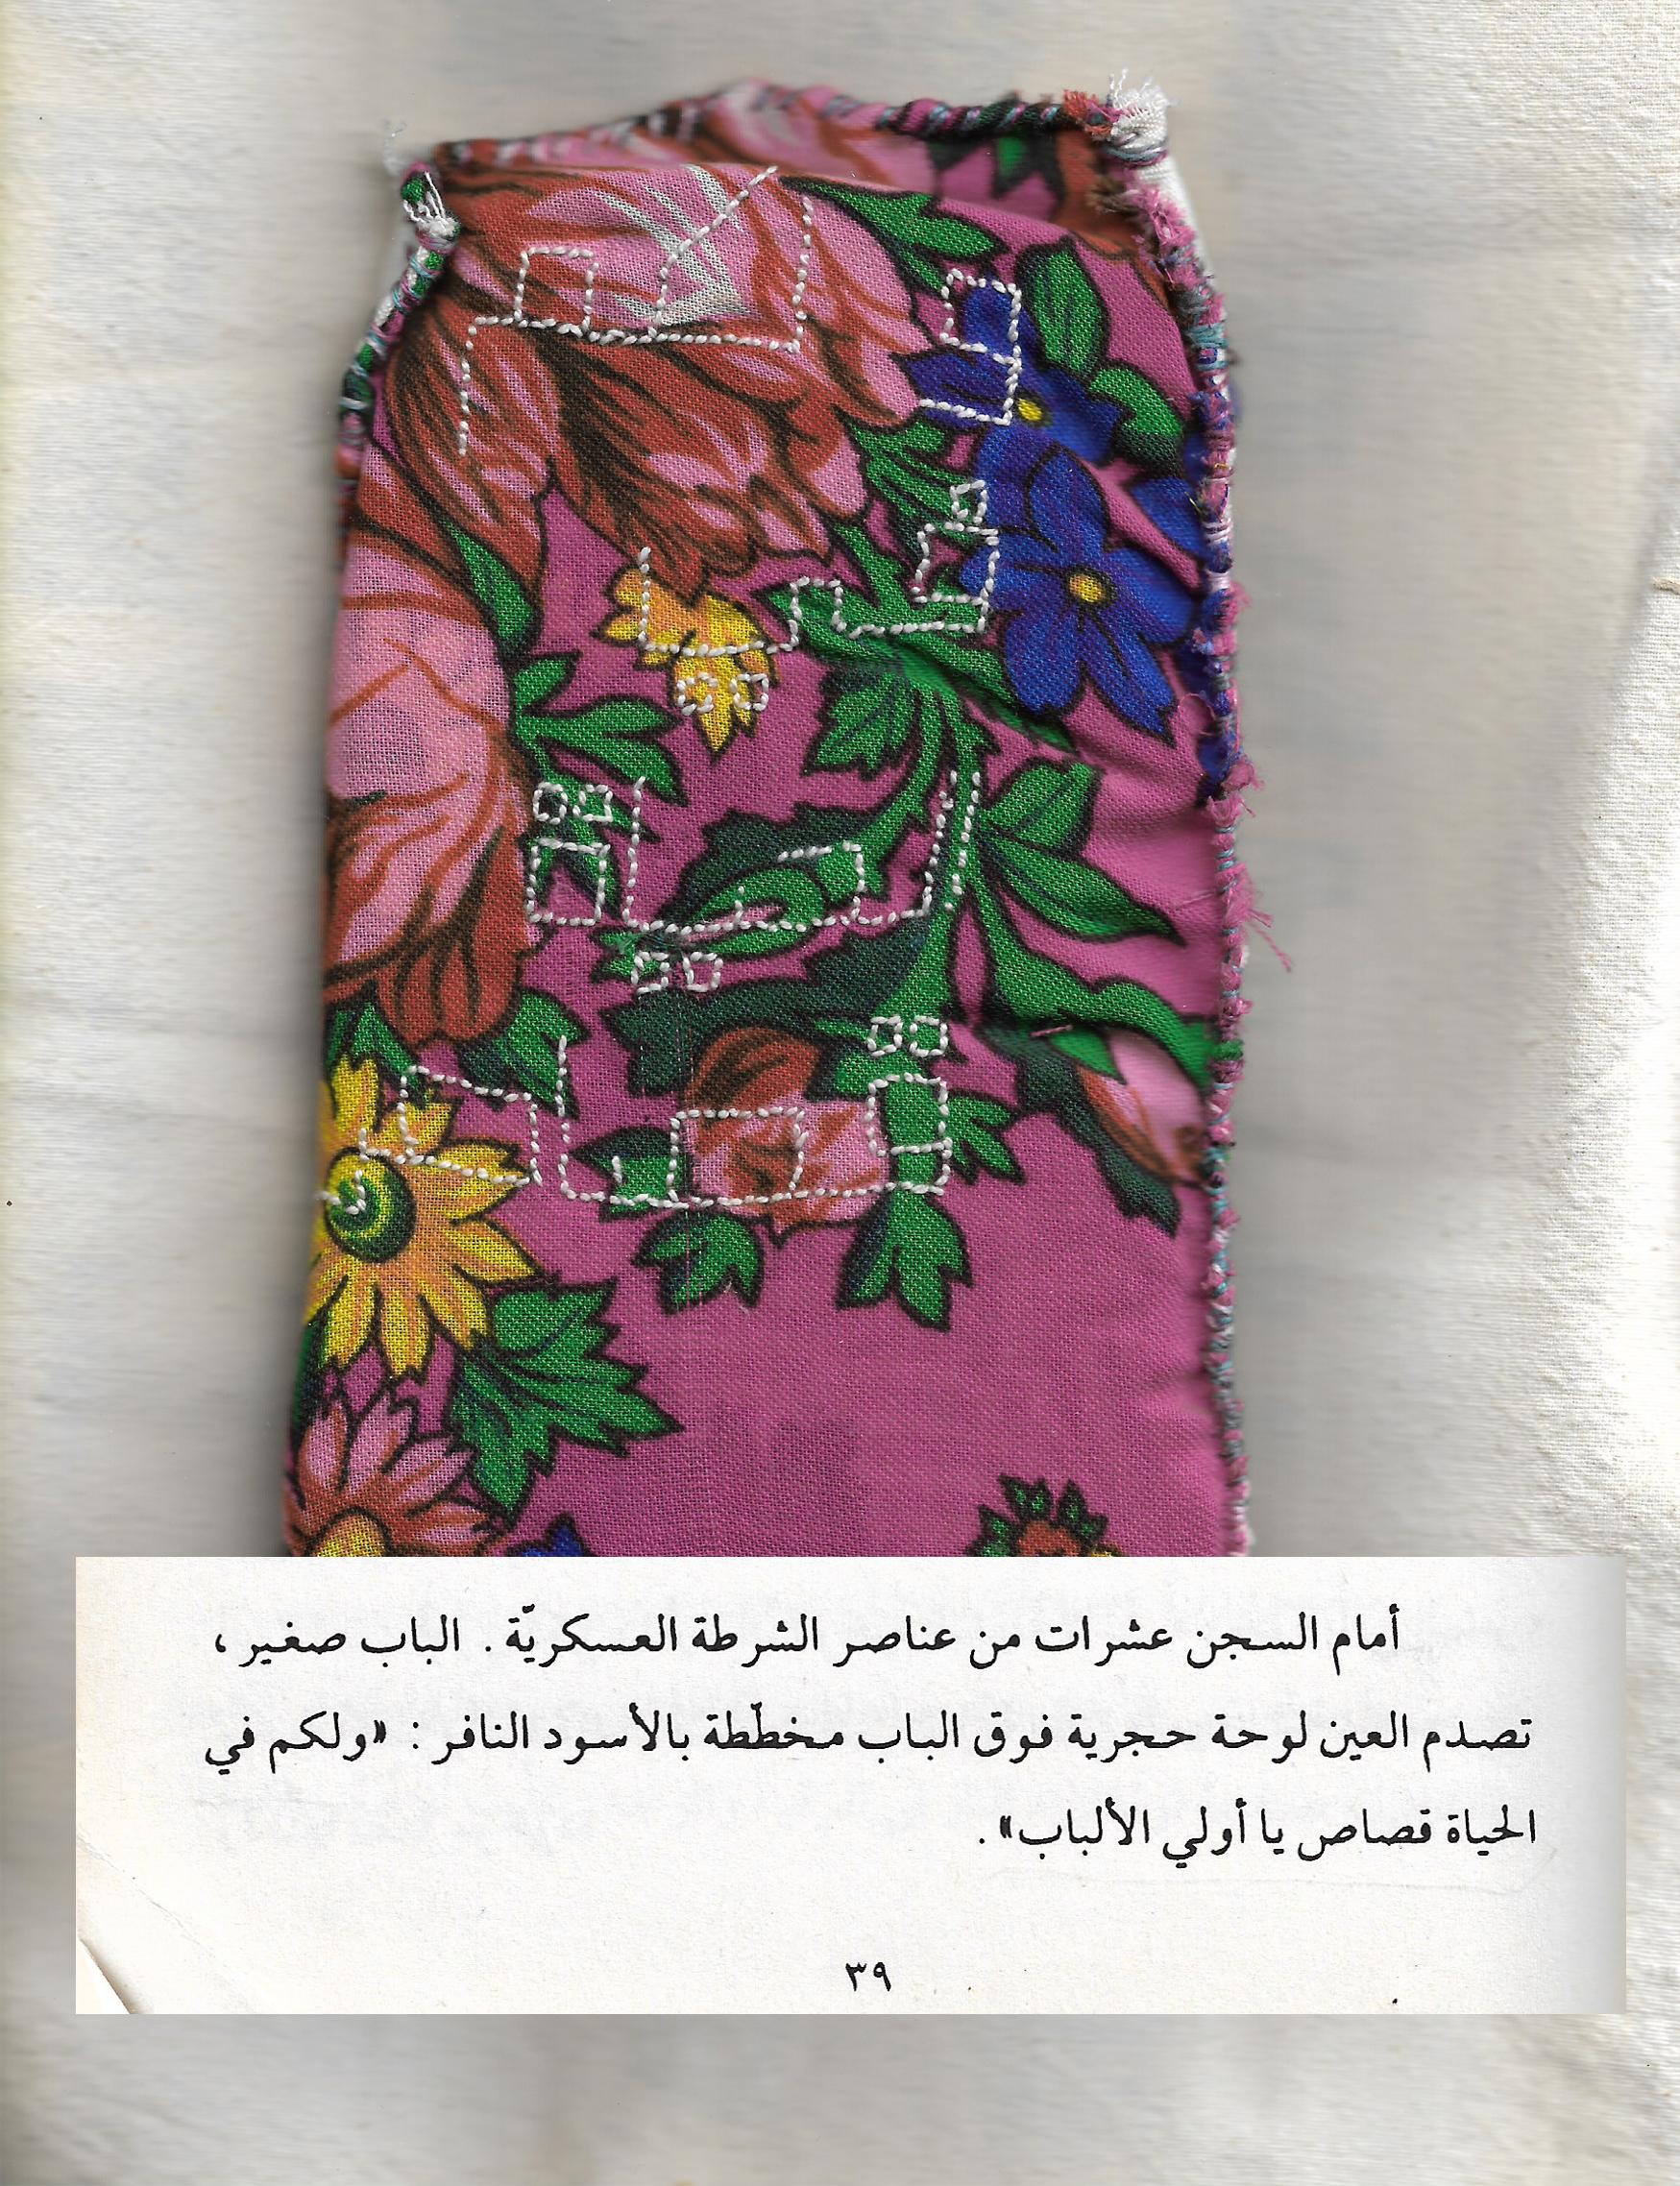 Majd Abdel Hamid (2019), Tadmur Prison blue print with text from 'The Shell' by Mustafa Khalifa.